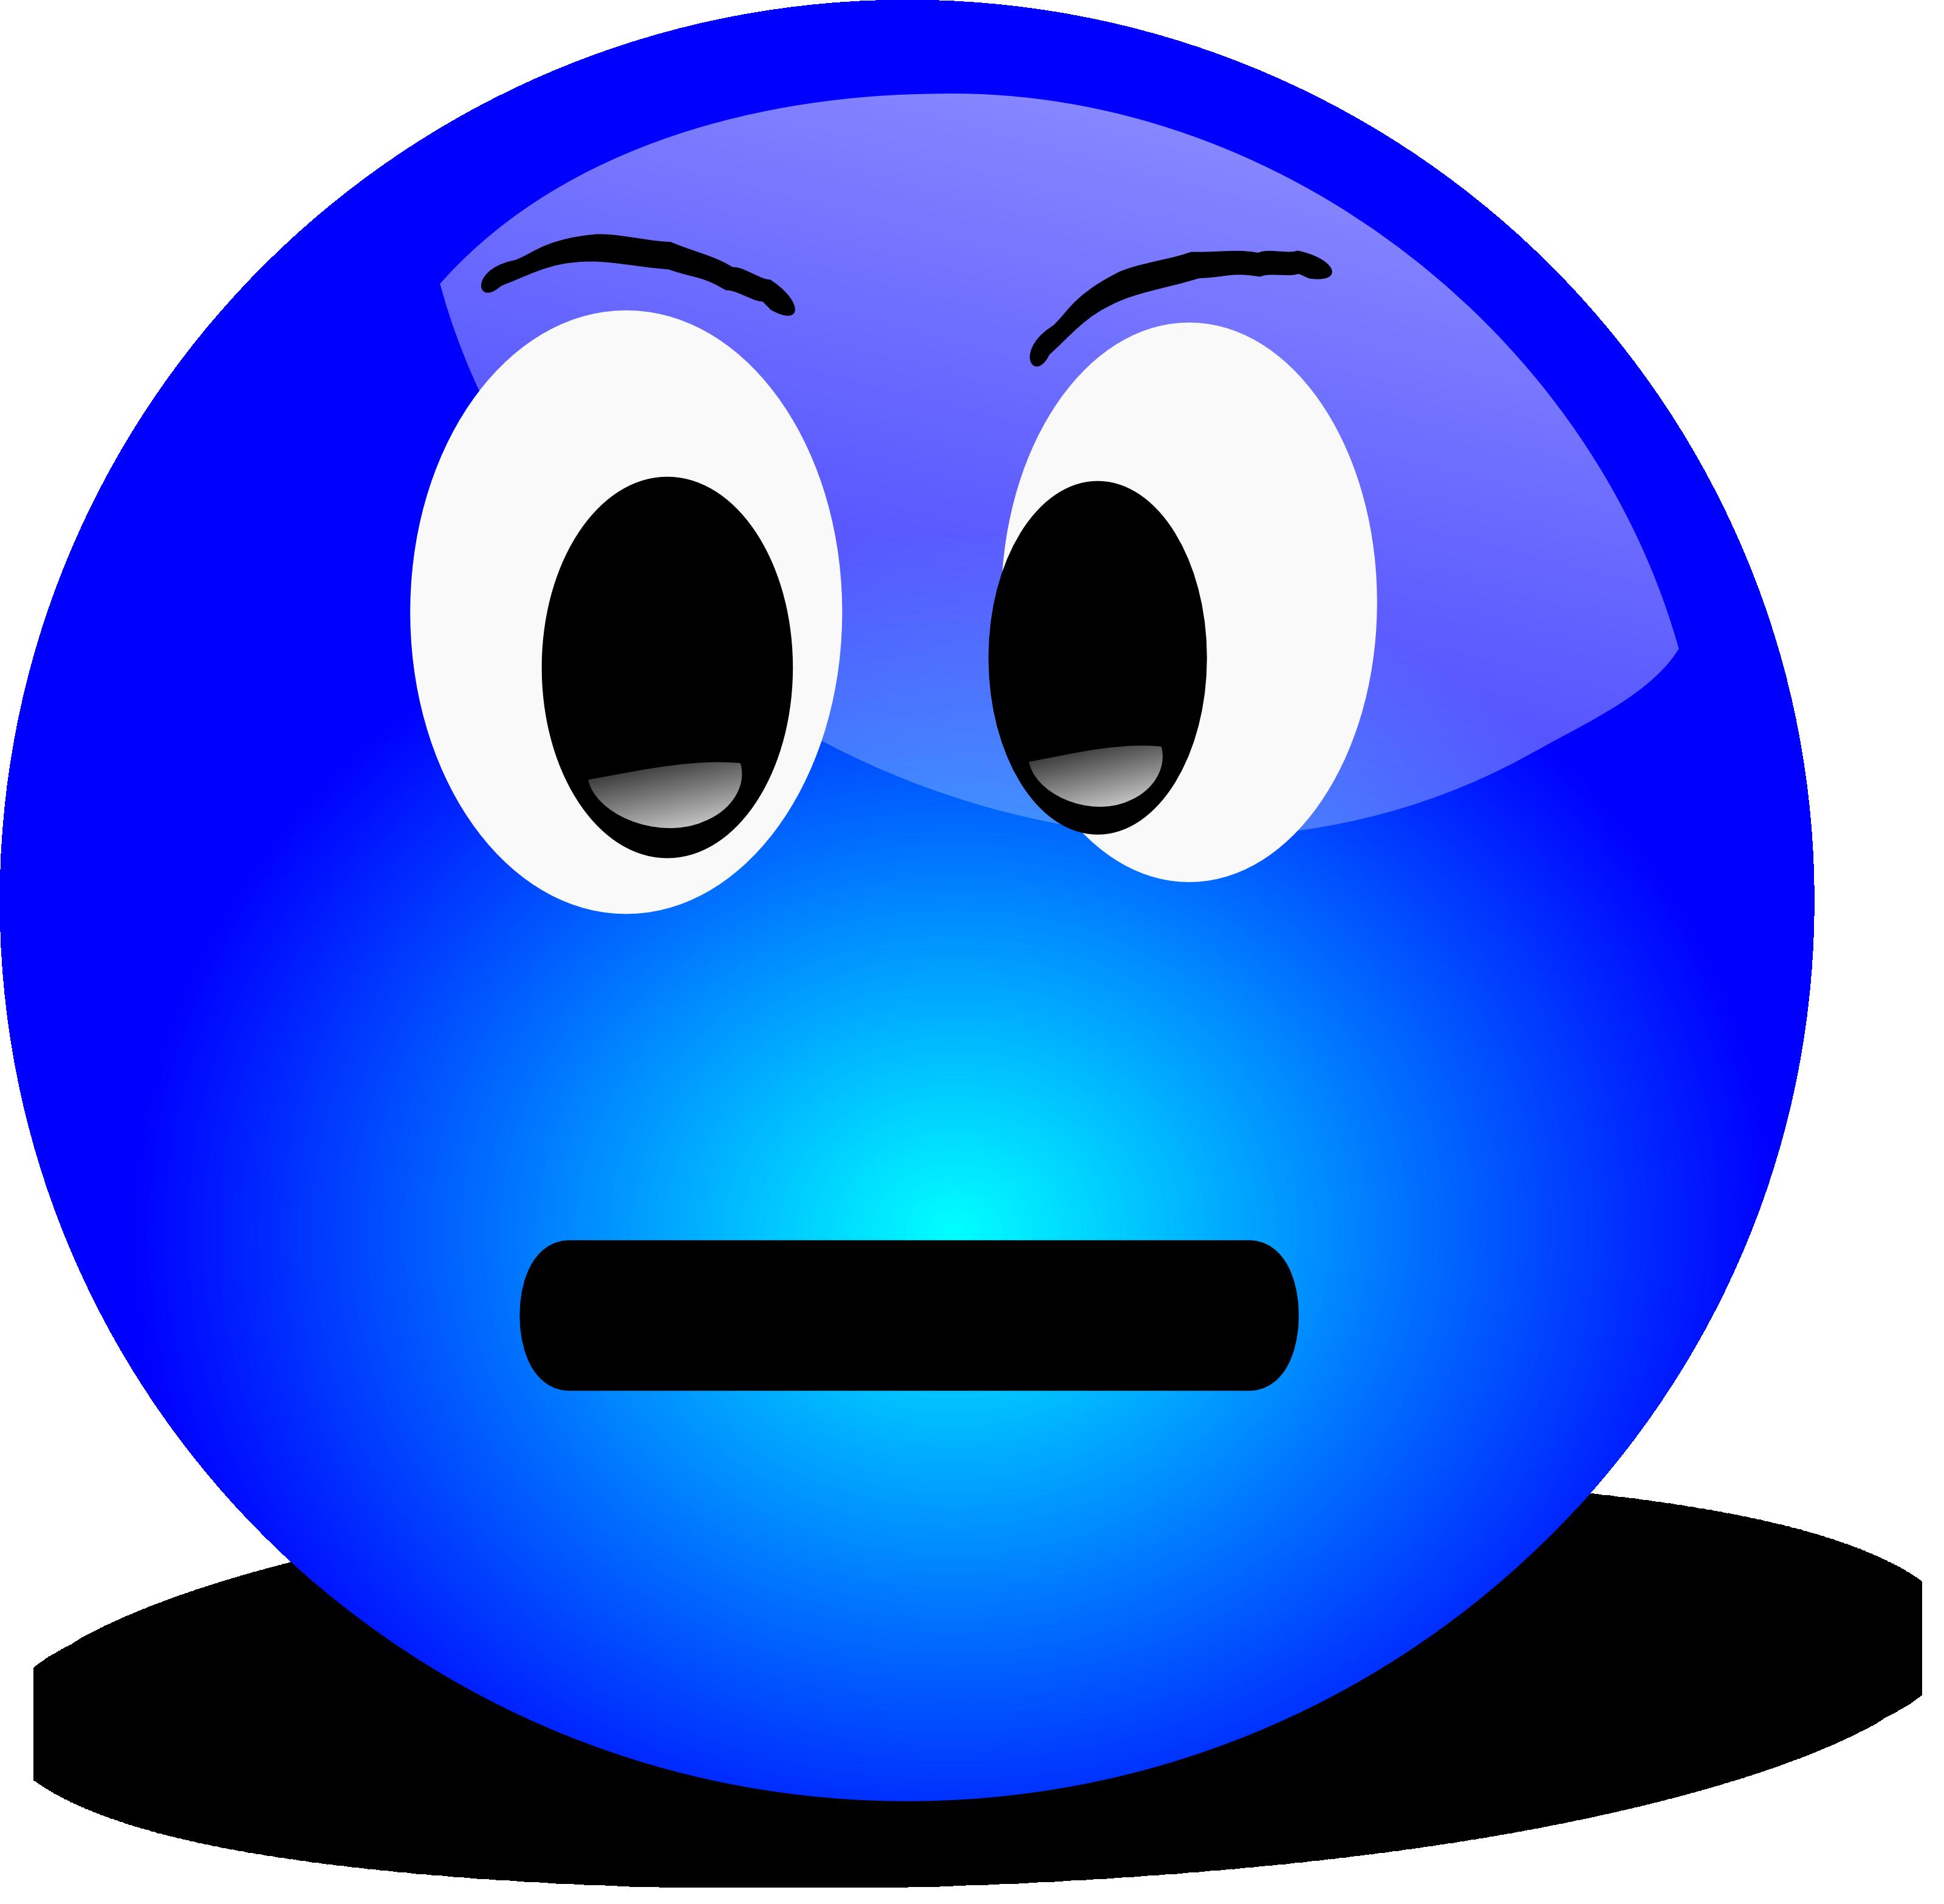 Free Grumpy Face Cliparts, Download Free Clip Art, Free Clip.